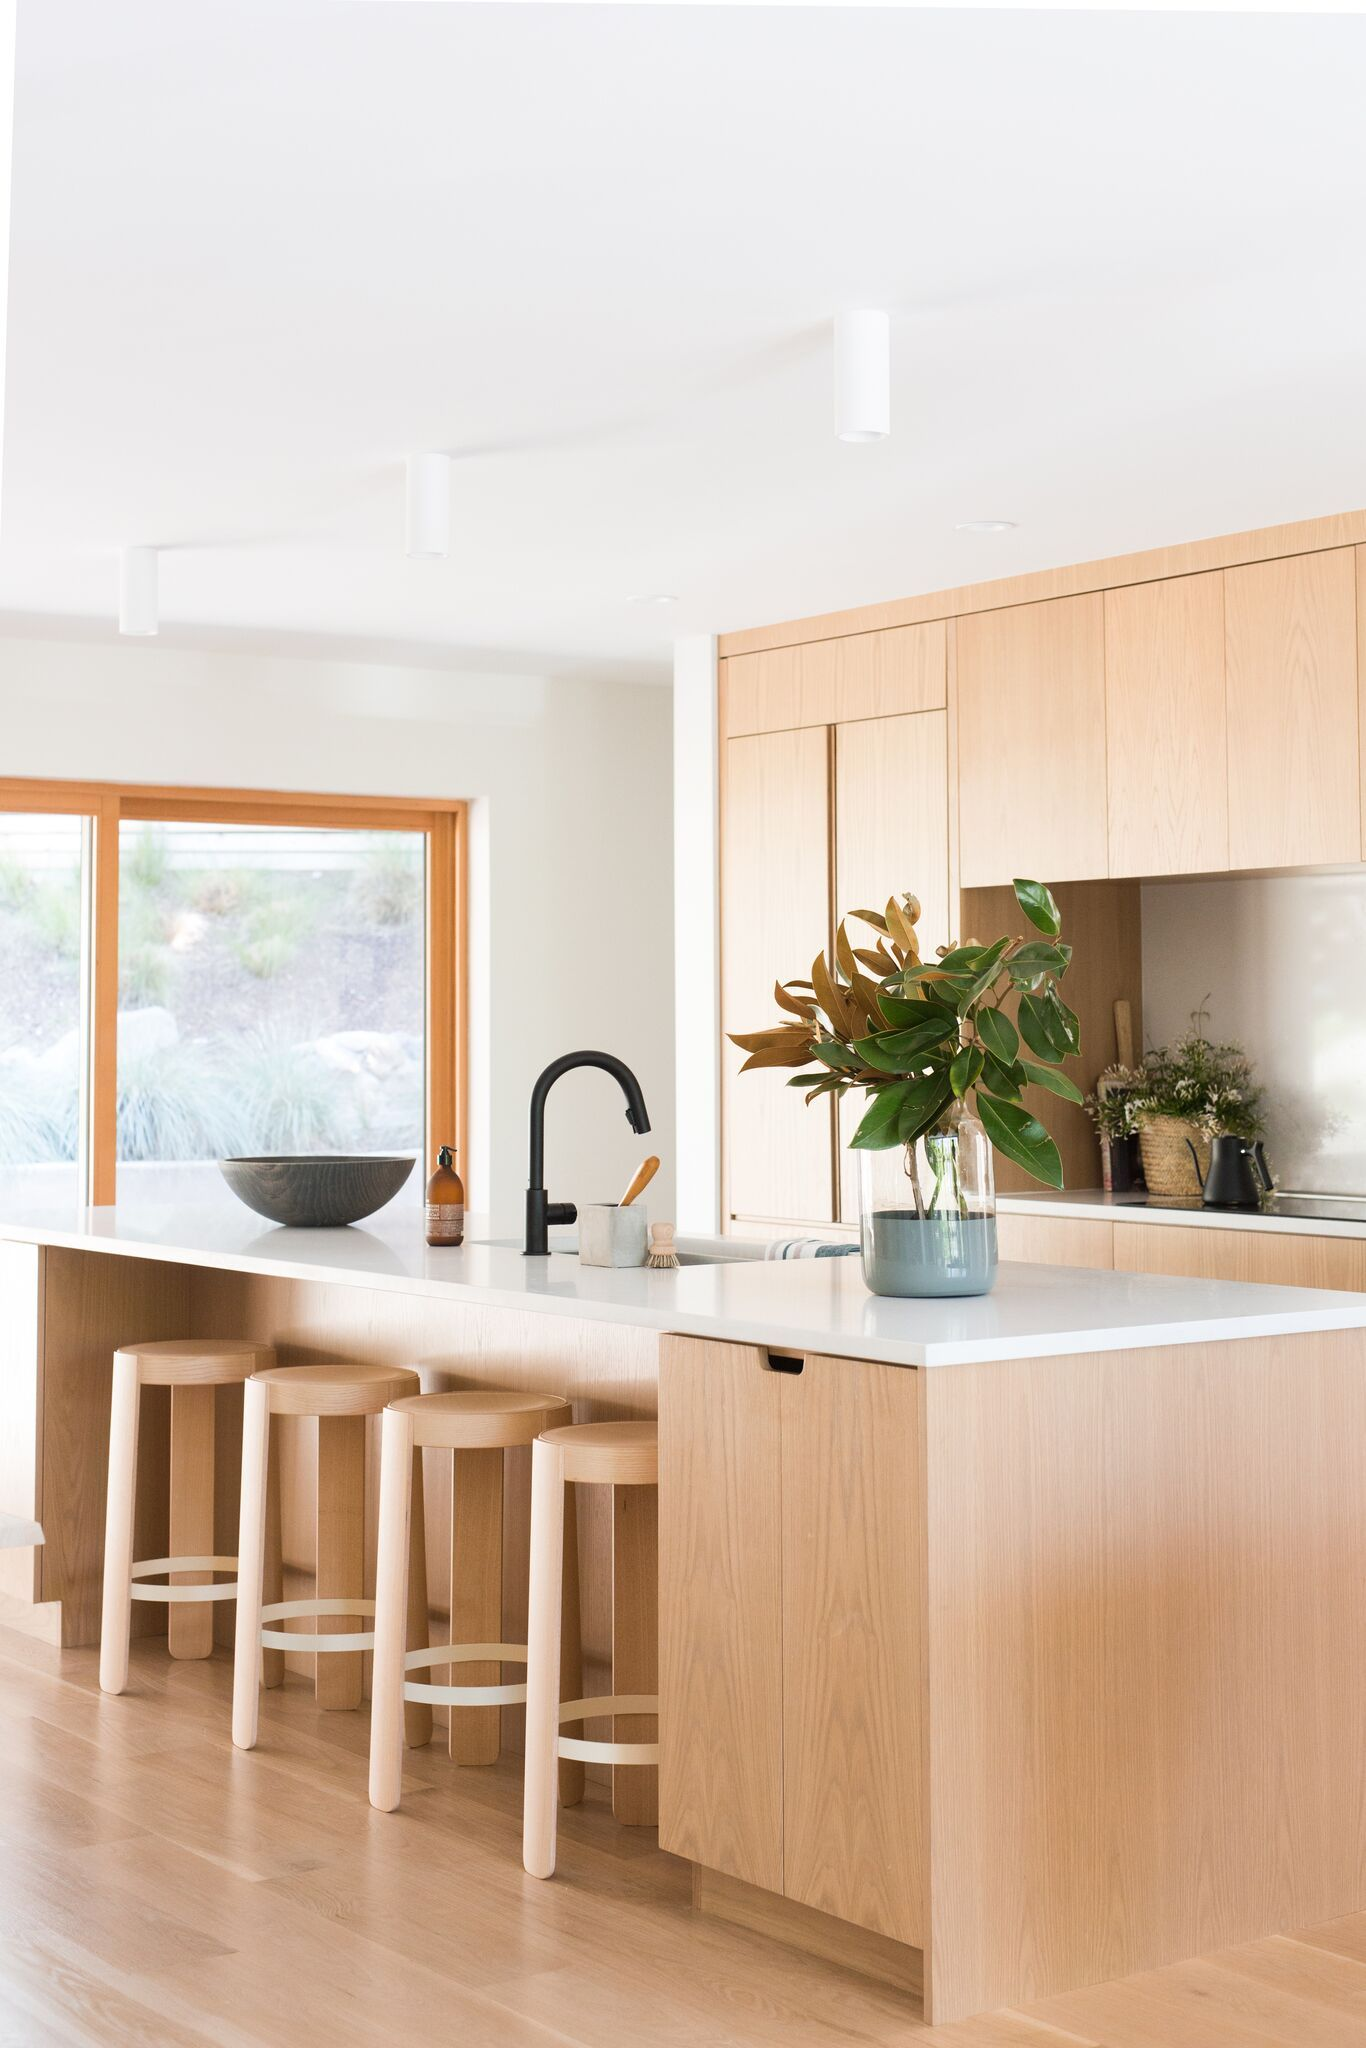 Avenues Modern Project Kitchen bar design, Minimalist